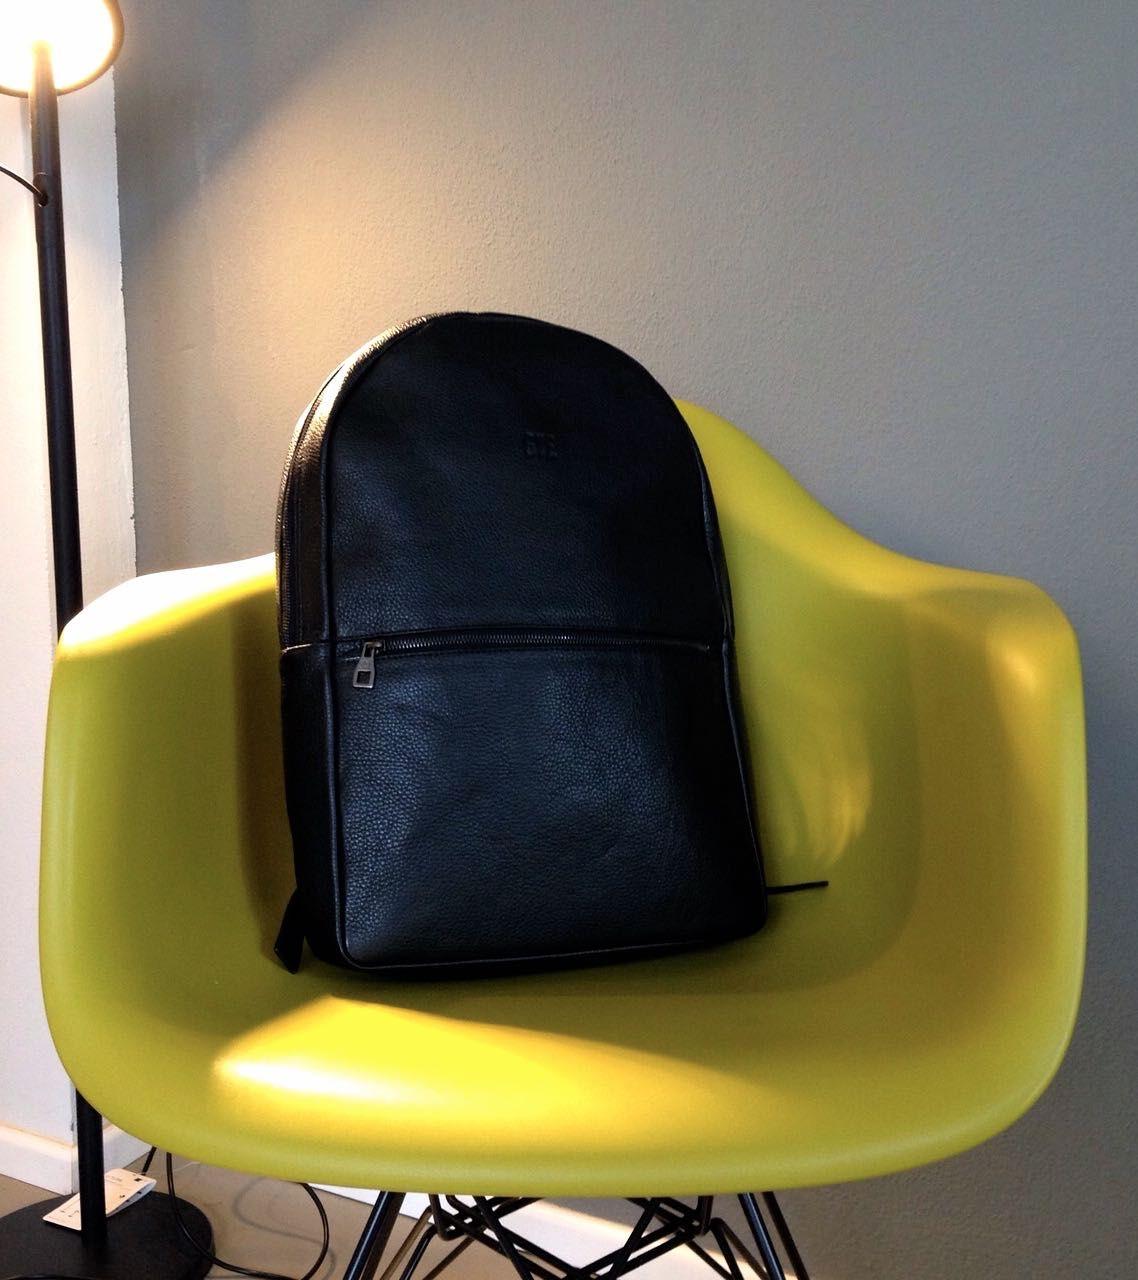 Souve Backpack aus Kalbsleder in schwarz bei BENS München im Store.  #bensstore #souve #munich #shopping #living #lifestyle